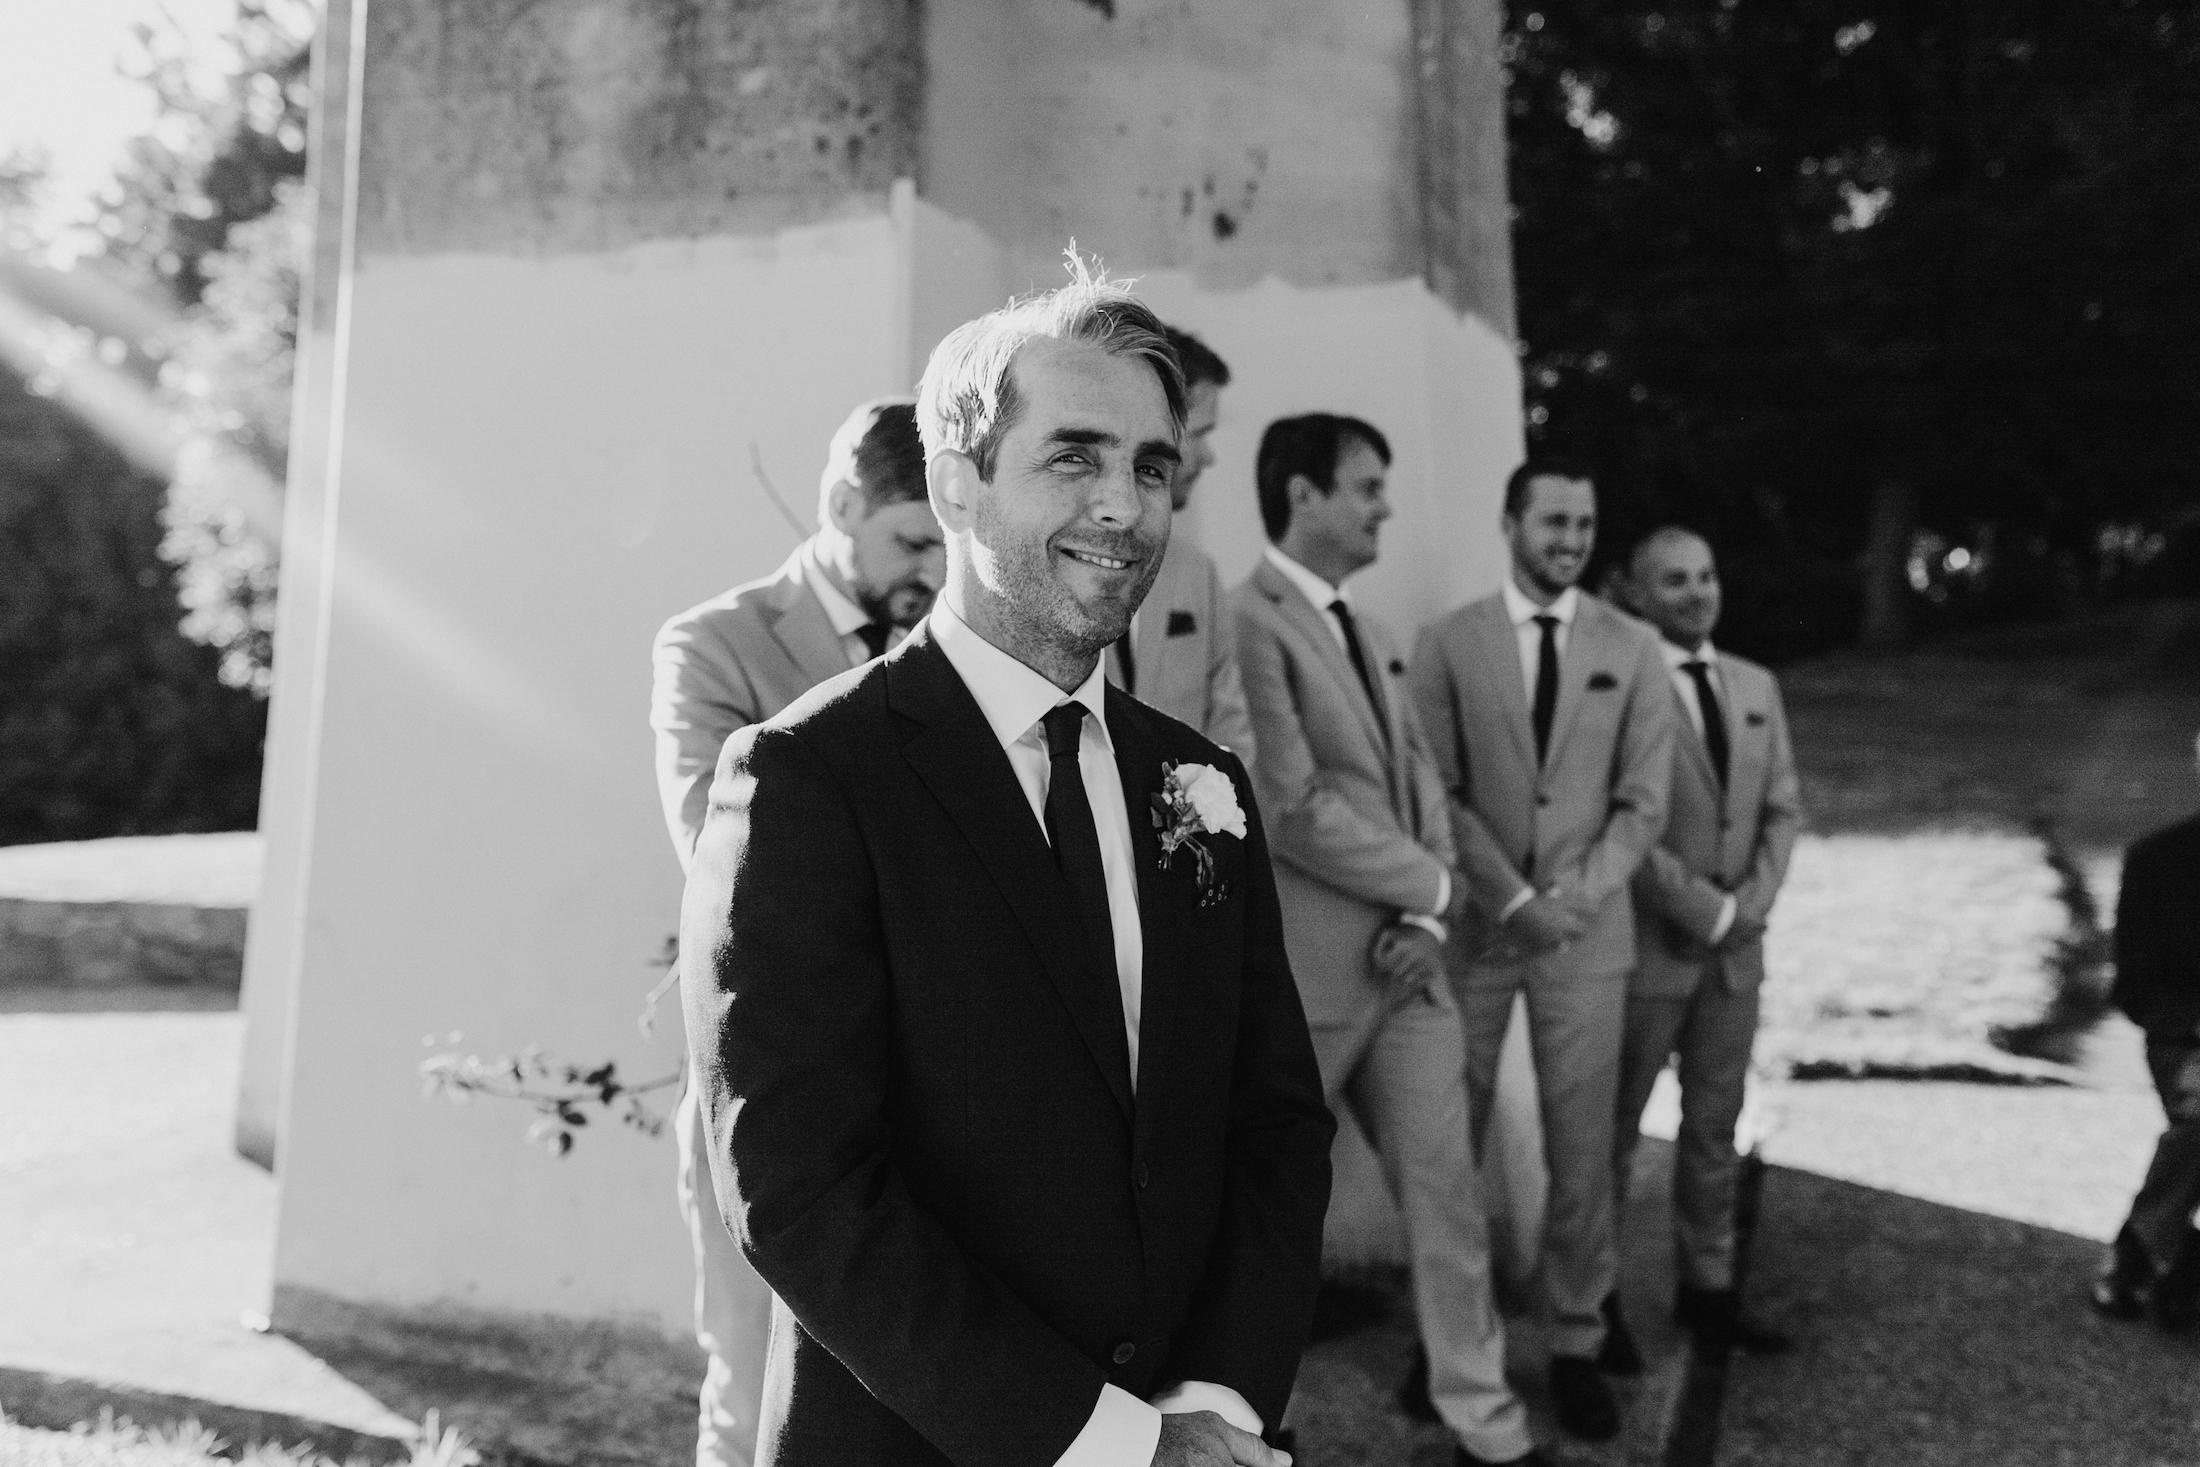 cathedral-park-portland-wedding-photographer-baker-building-wedding407.jpg